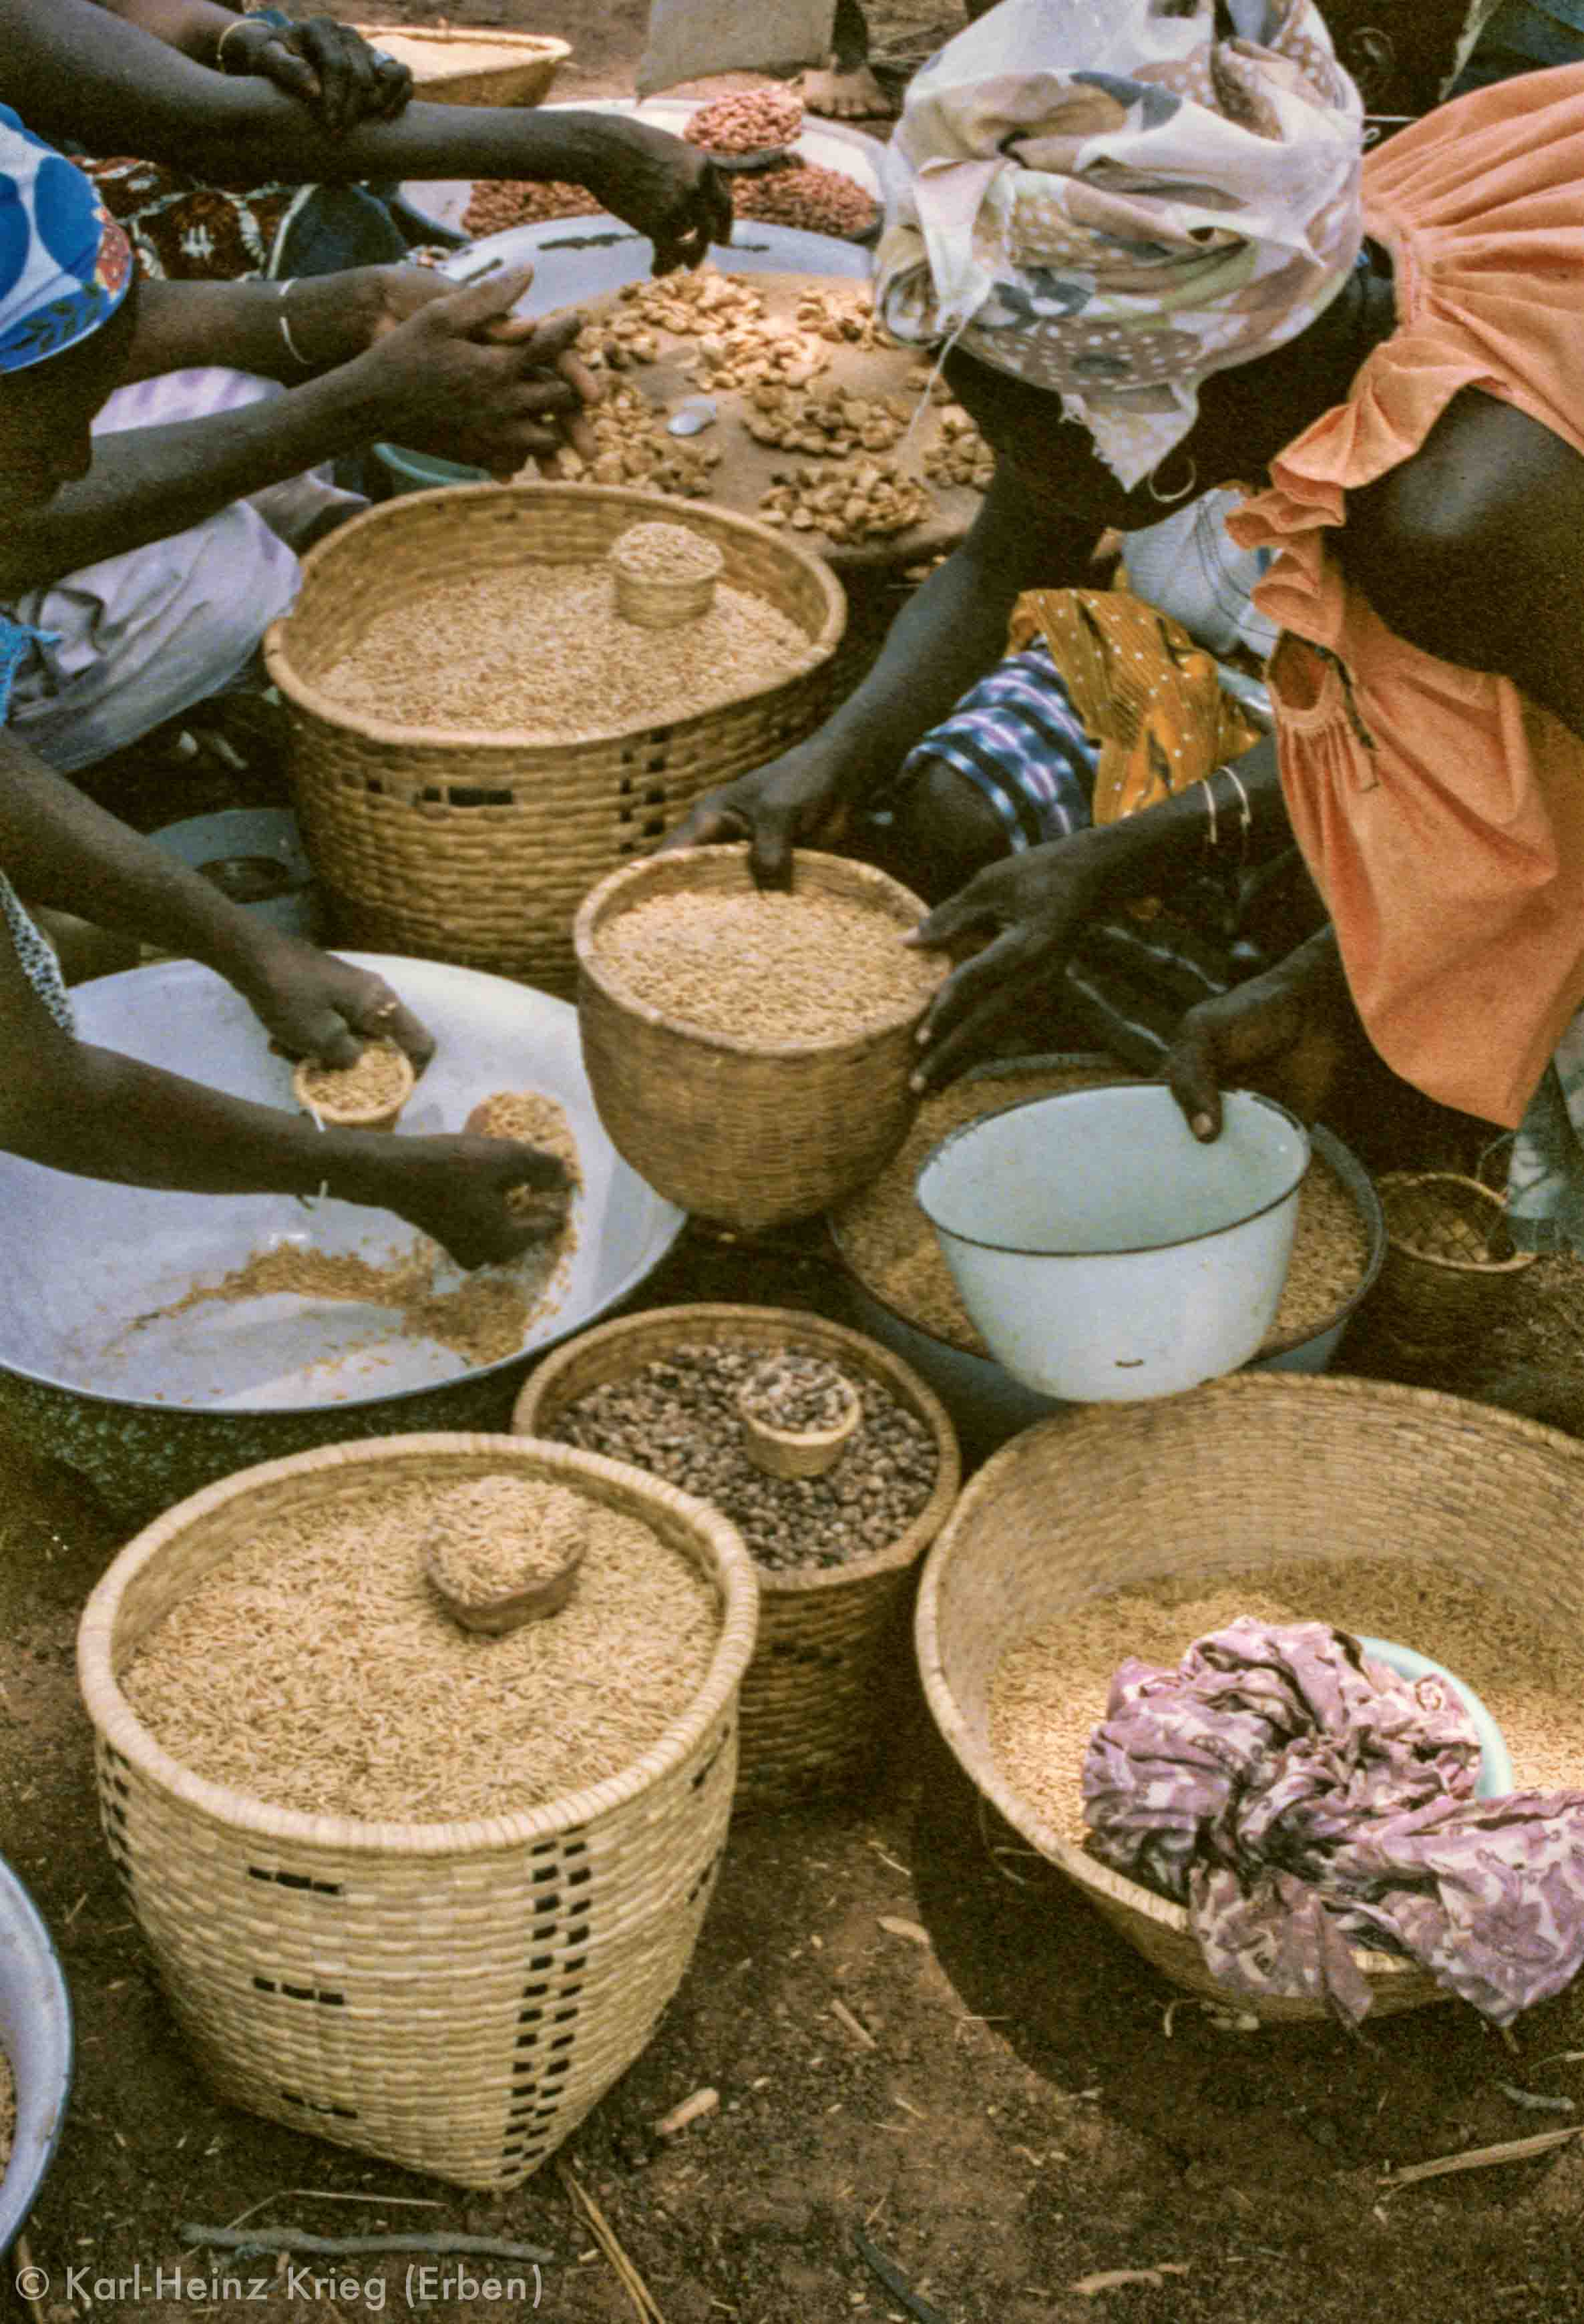 Foto: Karl-Heinz Krieg, Gouindougouba oder Tingréla (Region von Banfora, Burkina Faso), 1980